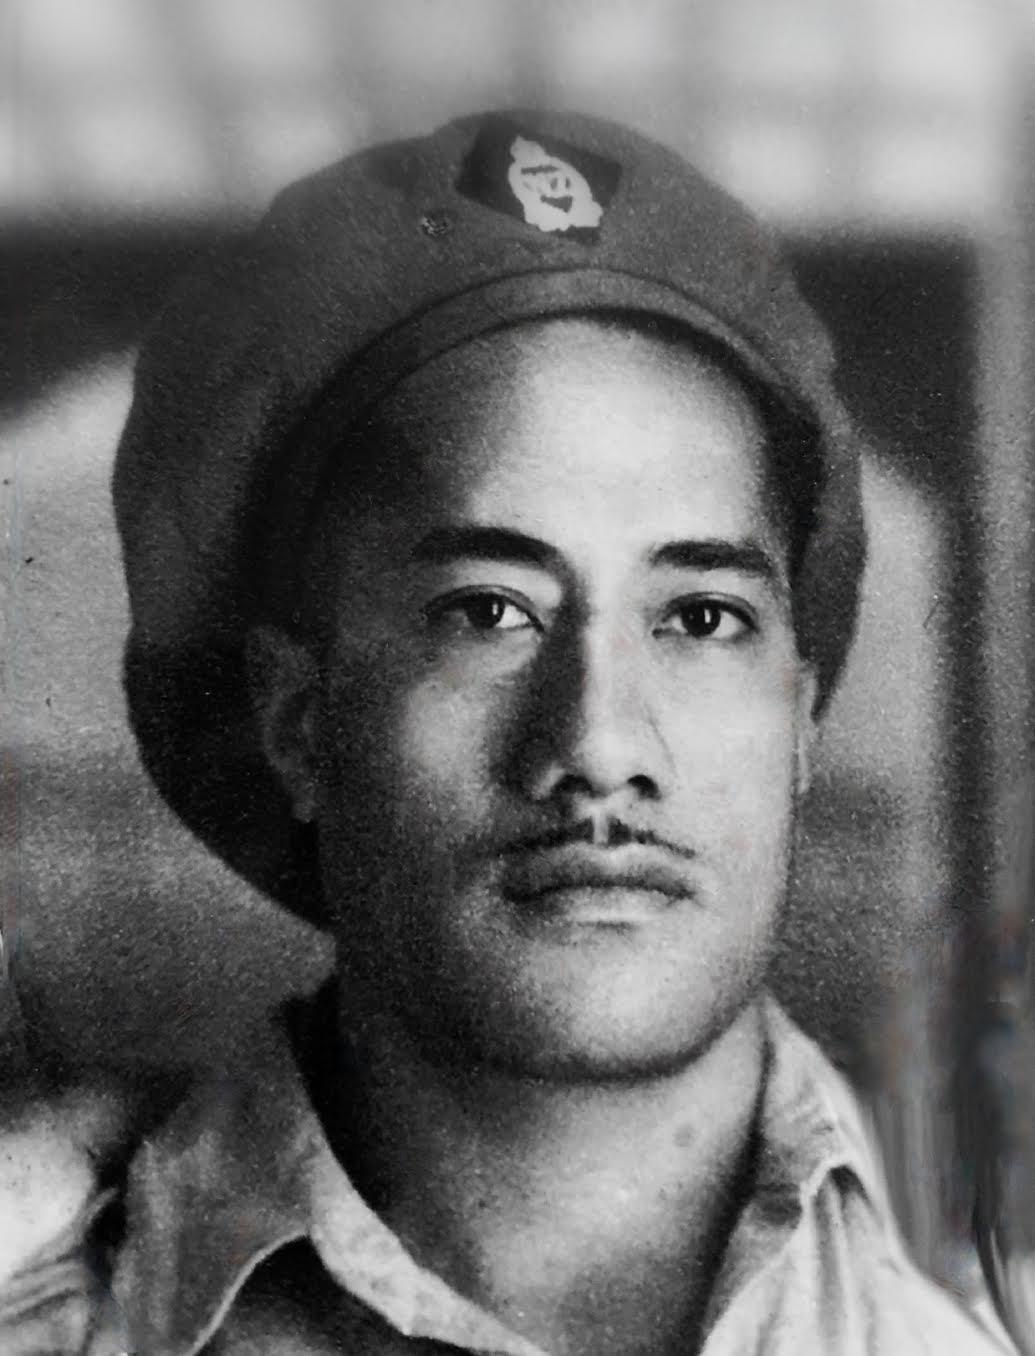 Tongan Soldier Joseph Vailima Tauaika Meanata Snr served in the 28th Māori Battalion. Photo: Supplied